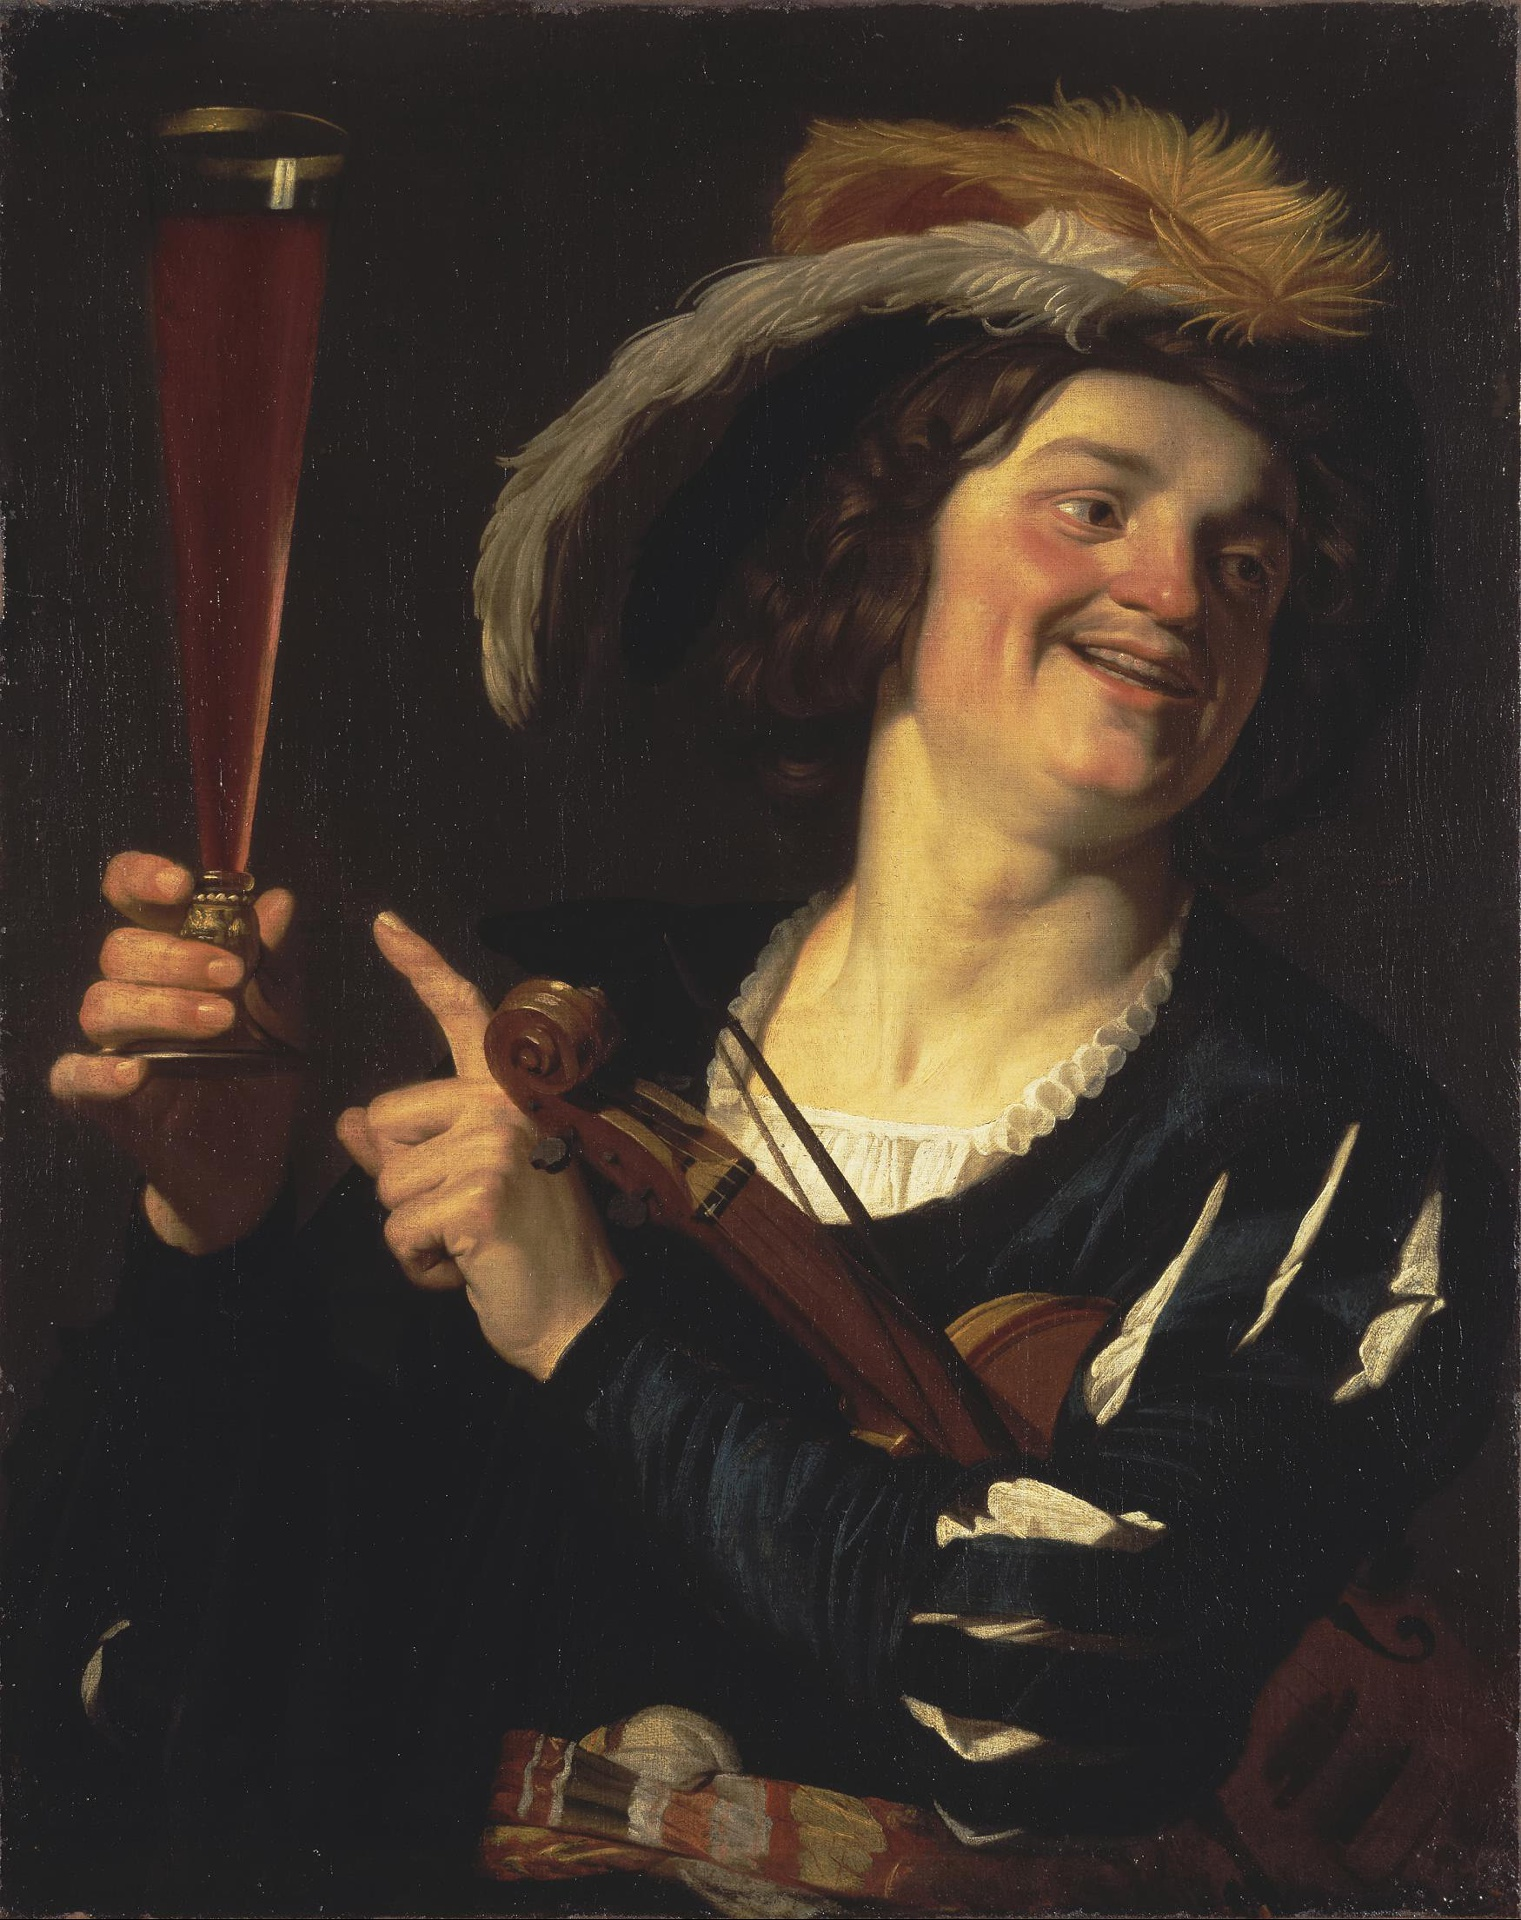 Honthorst 1624 Le joyeux convive Ermitage